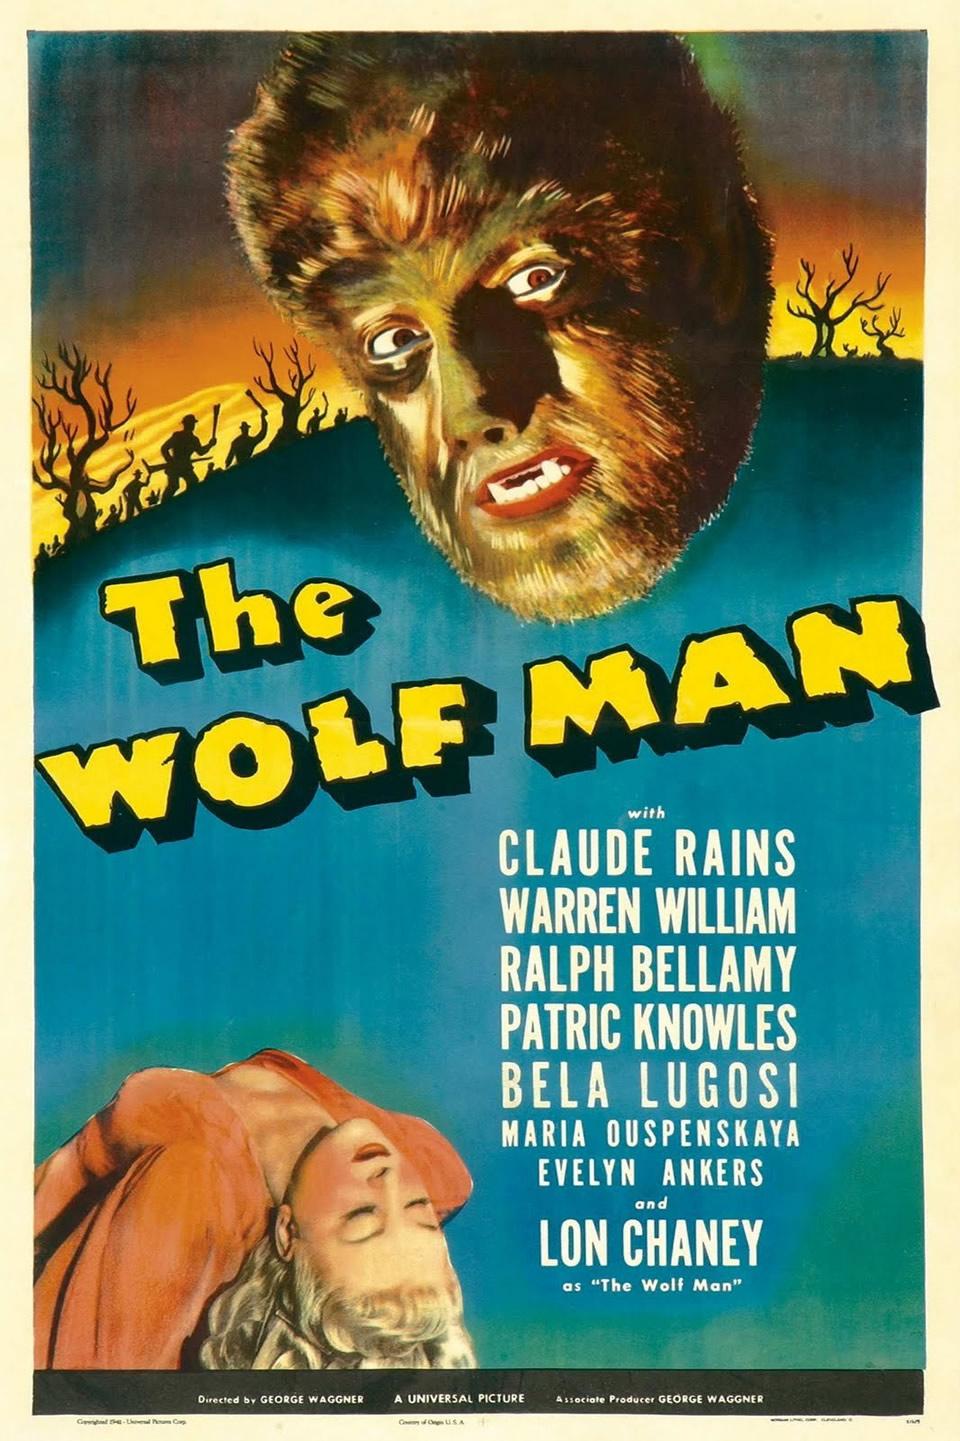 27 - The Wolf Man (1941)